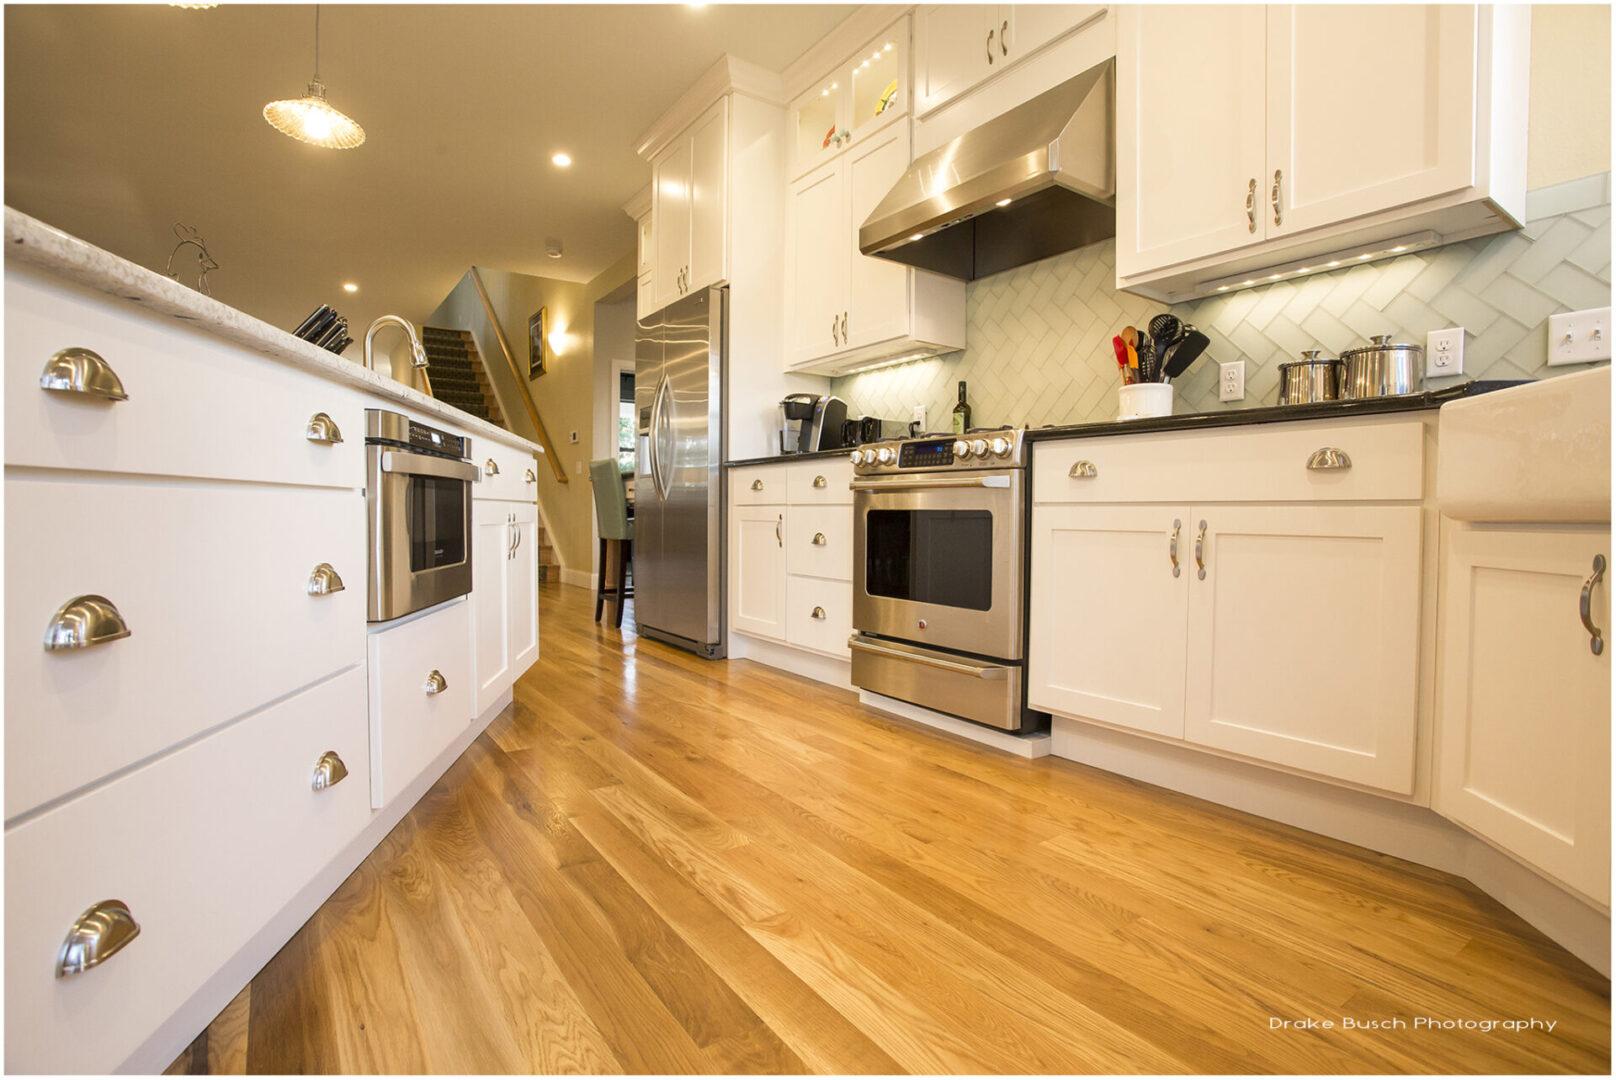 kitchen with hardwood floors and white furnishings